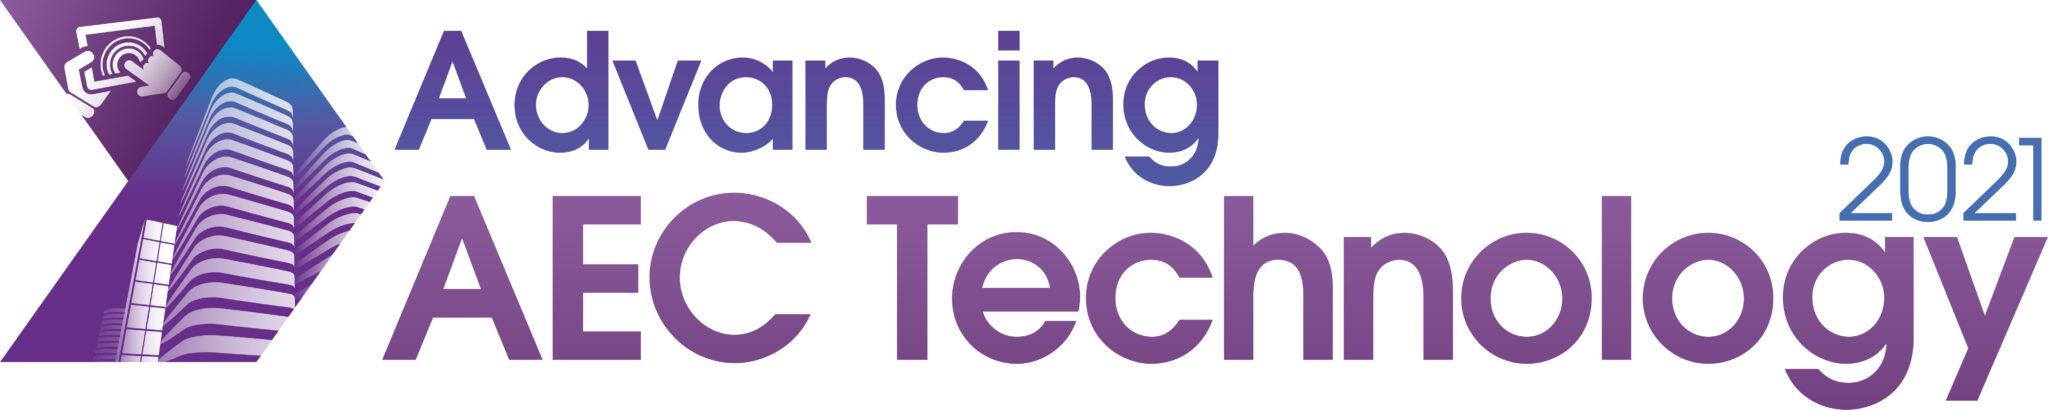 HW210116-Advancing-AEC-Technology-2021-logo_NO-STRAP-2048x410